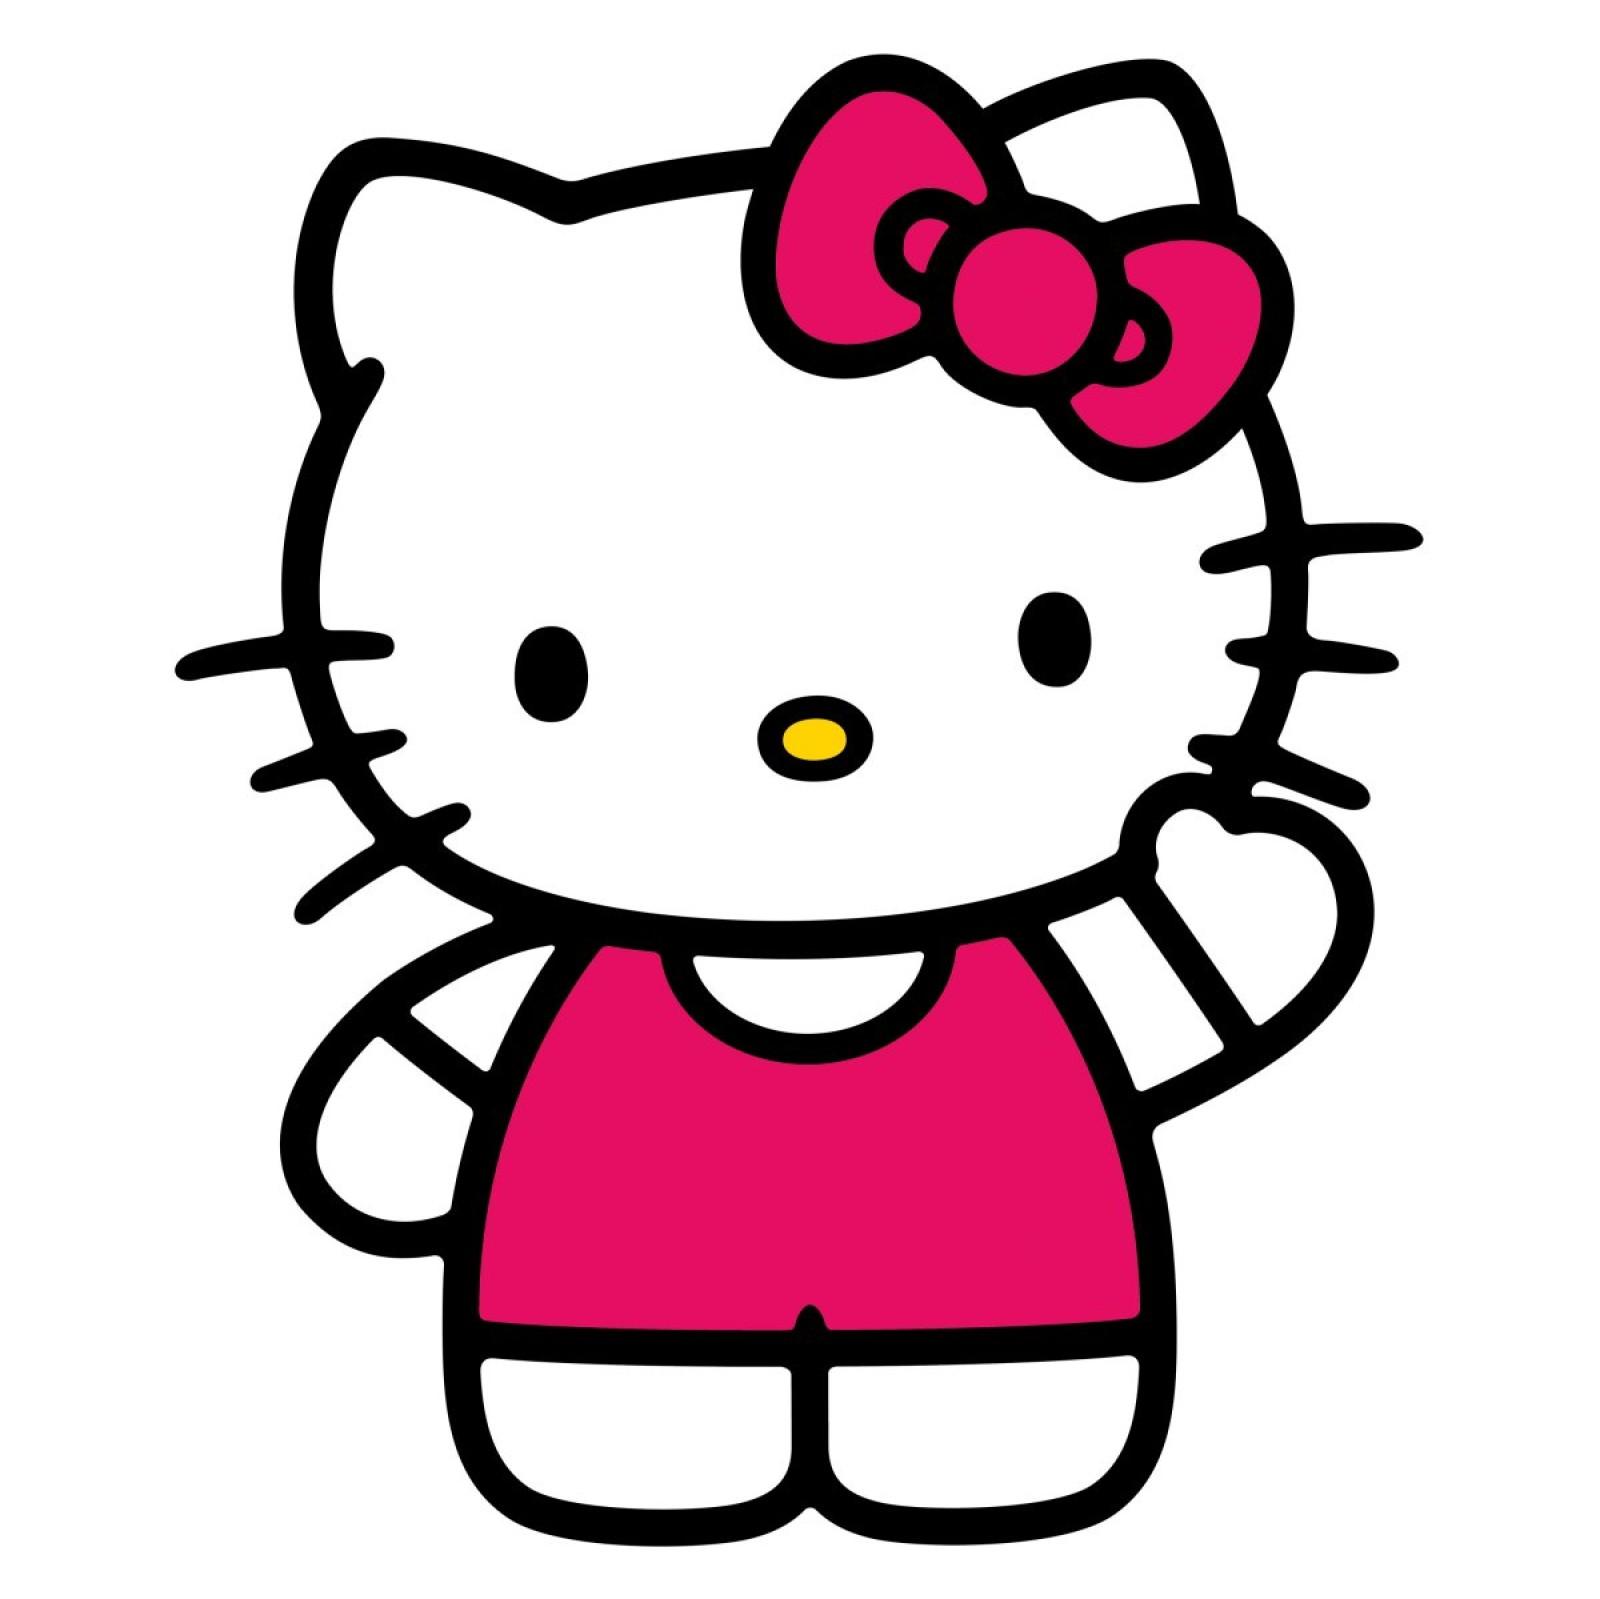 kitty pierde în greutate